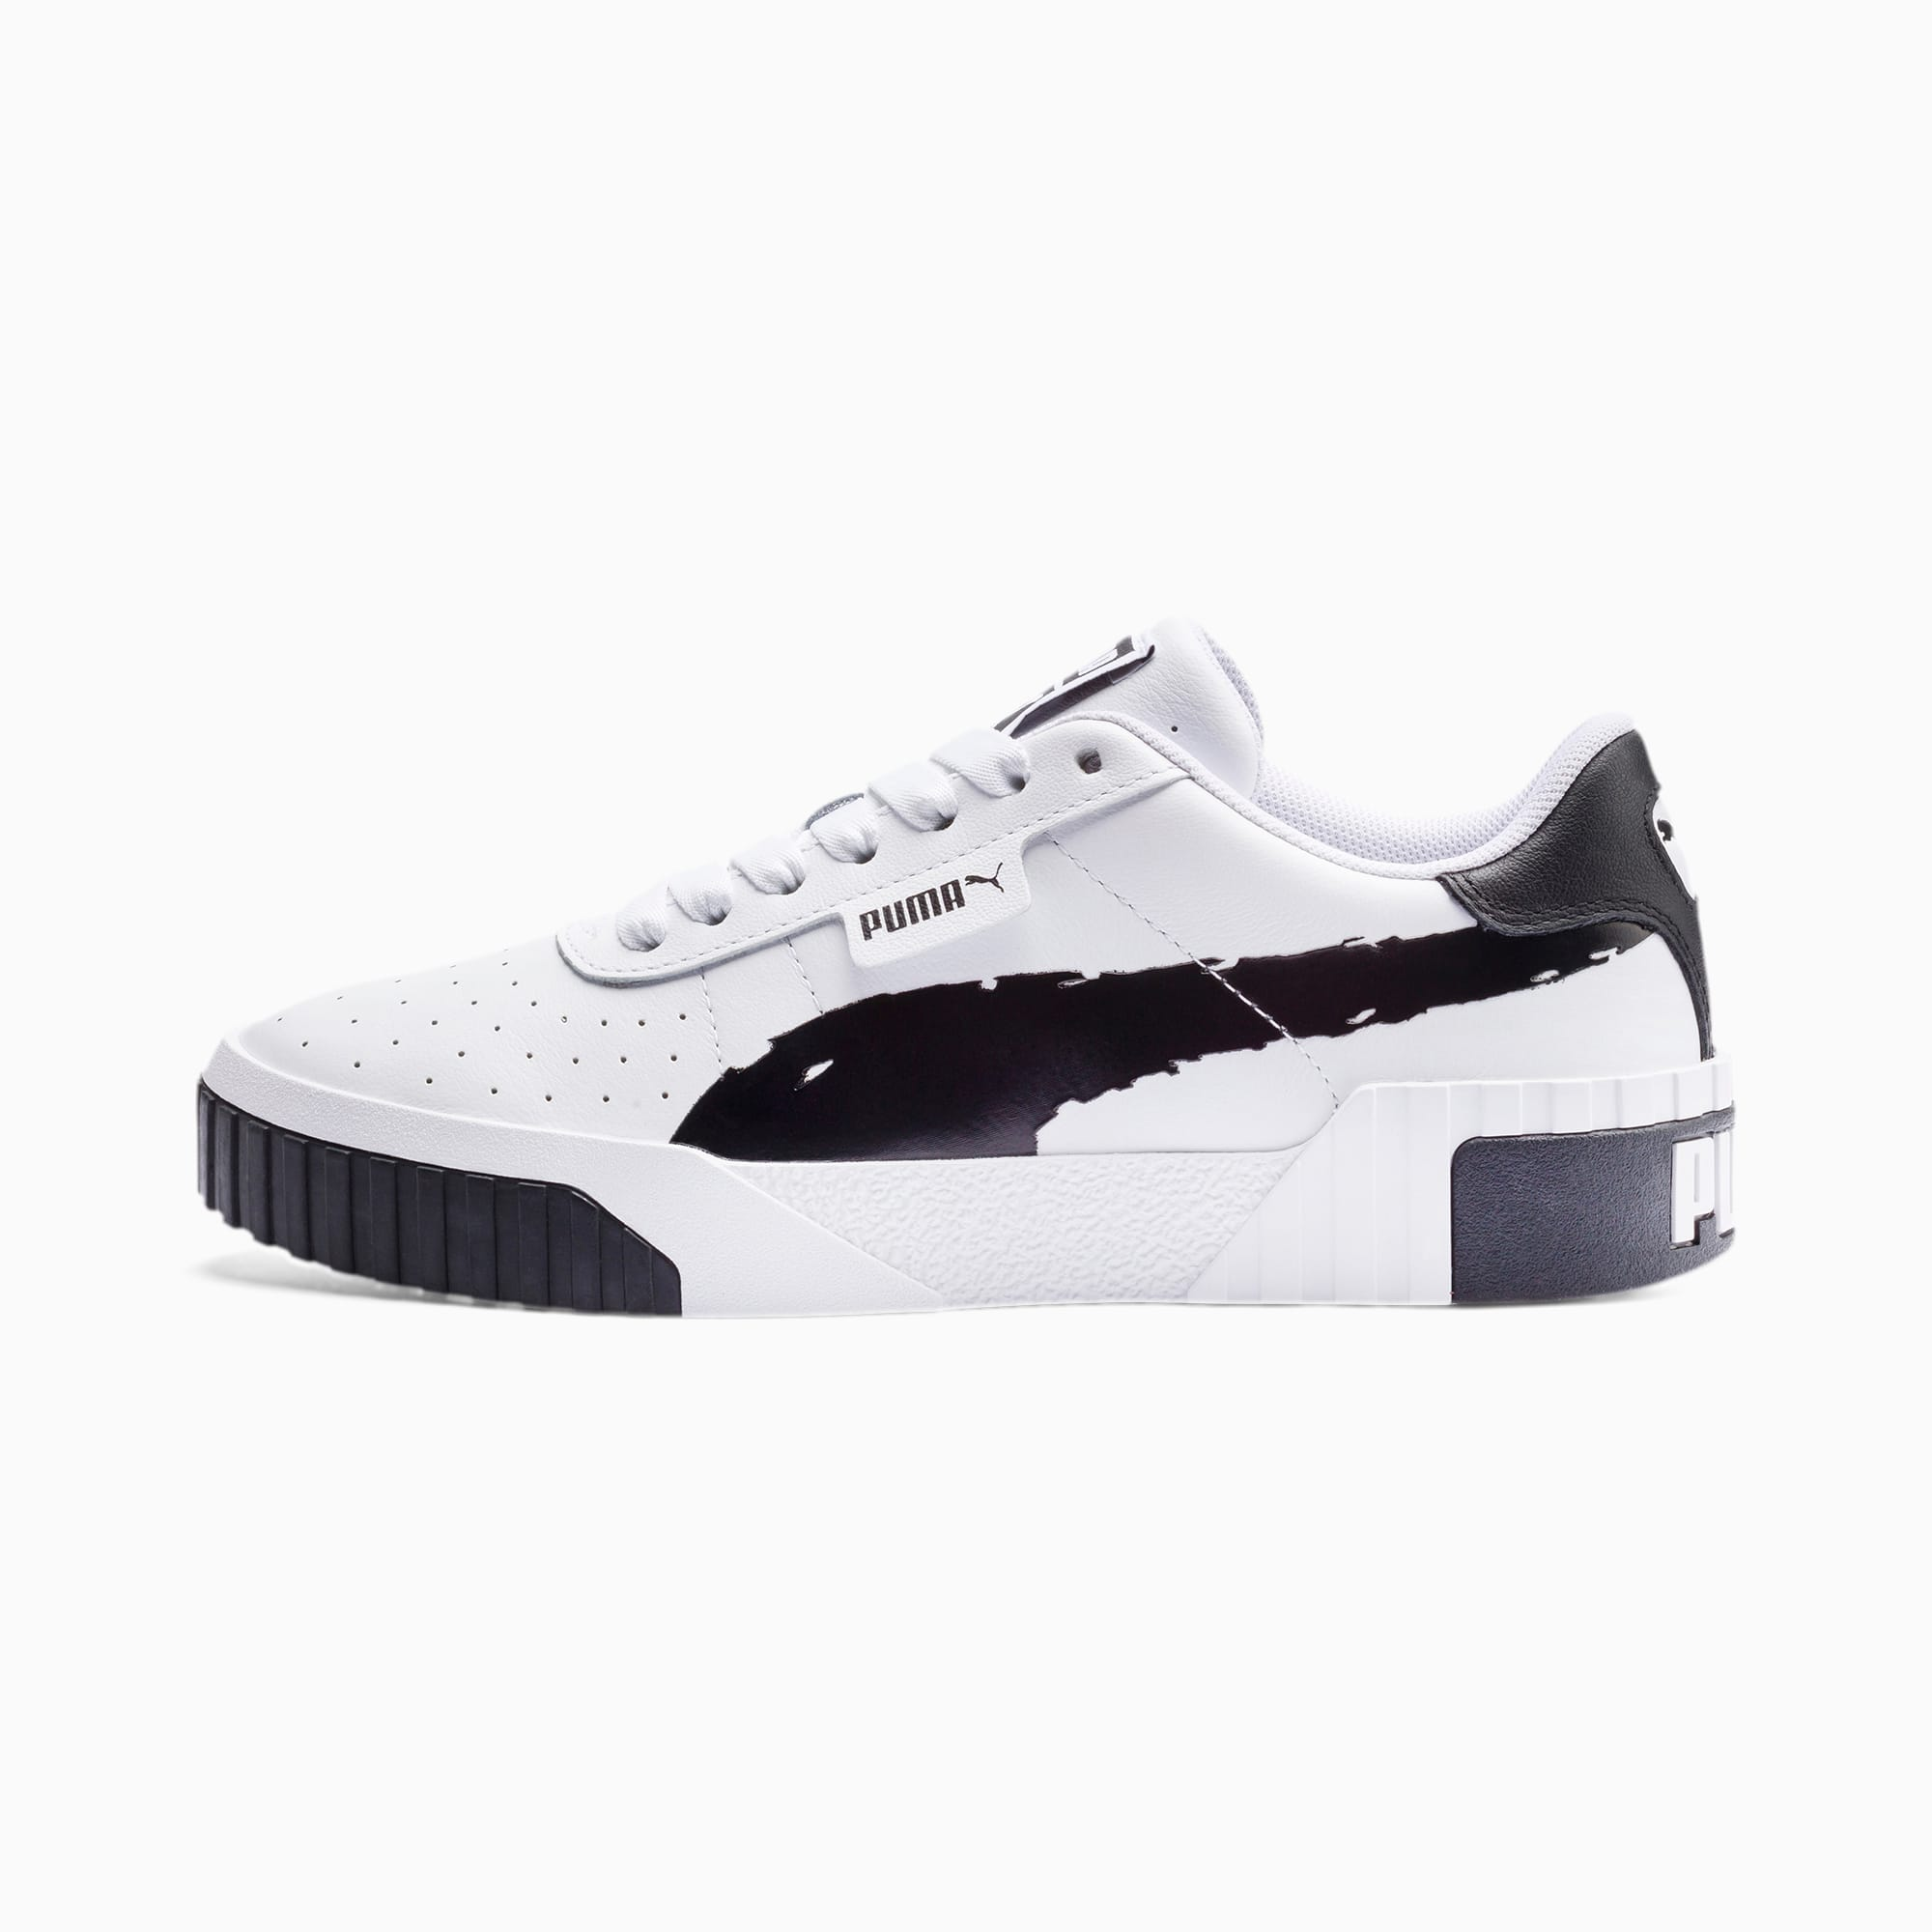 scarpe tennis puma donna